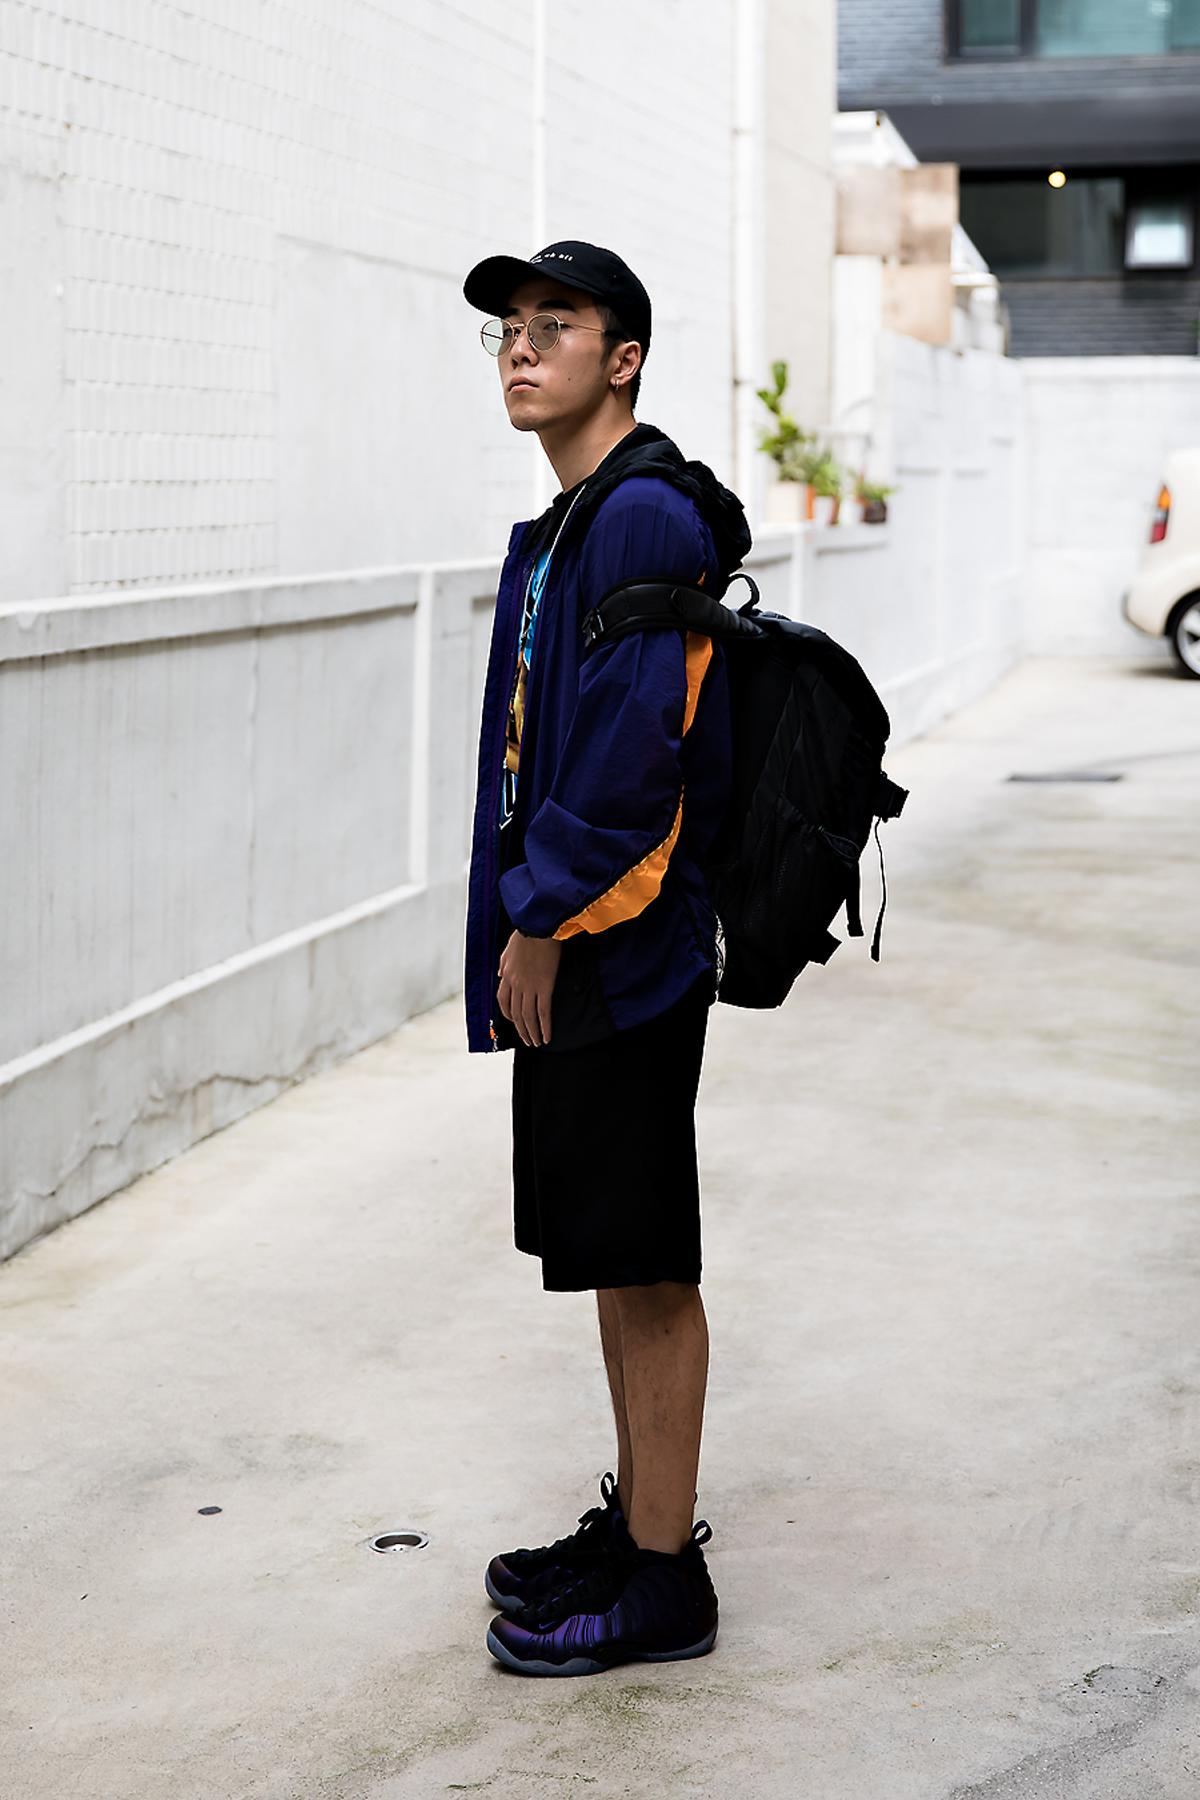 Ule Cheng, Street Fashion 2017 in Seoul